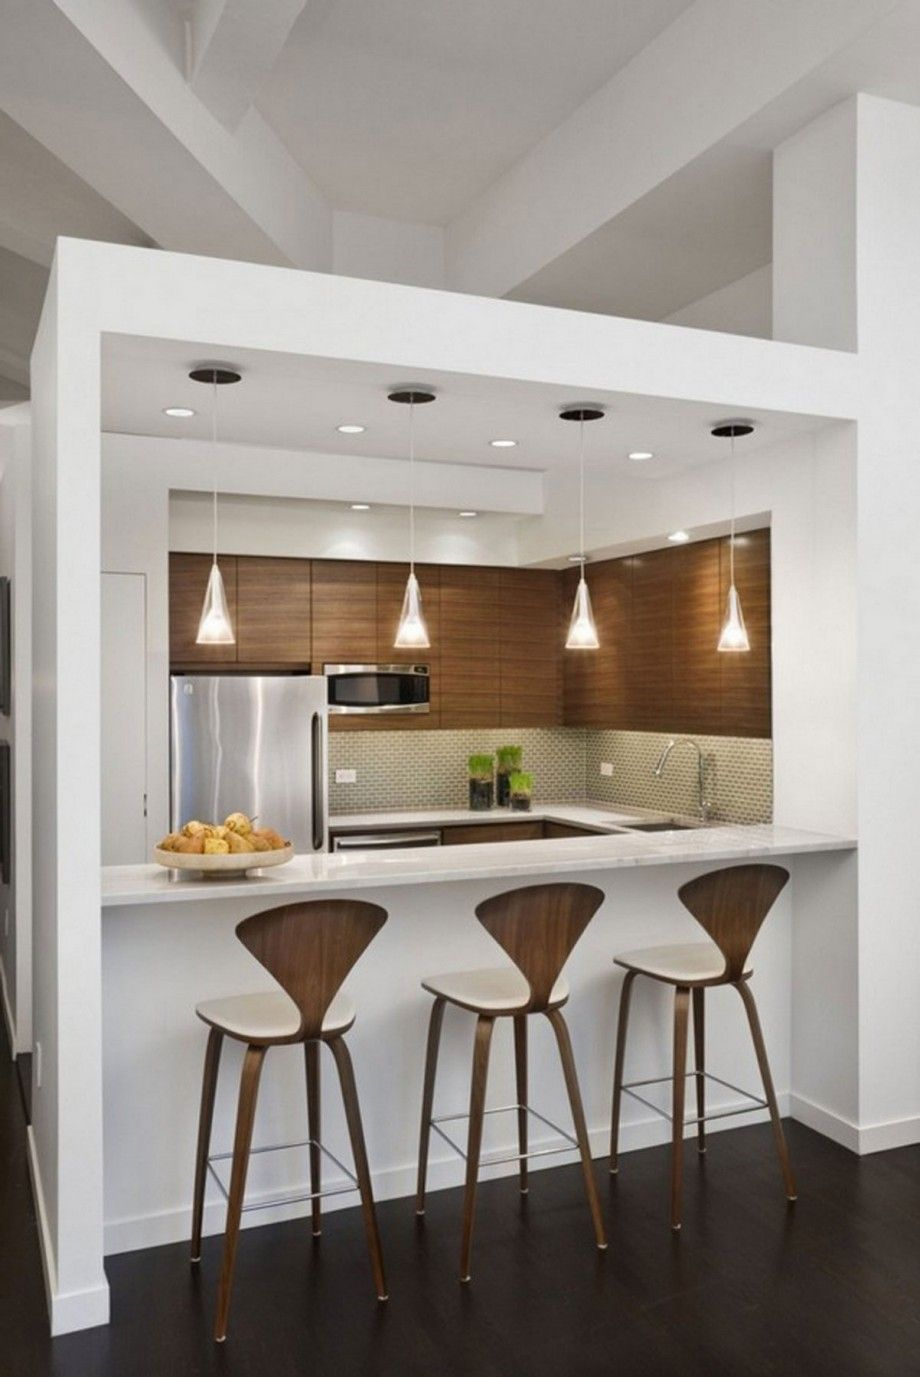 Exceptional Renovation Of A New York Loftixdesign  Kitchen Best Small Kitchen Design Ideas 2014 Decorating Design